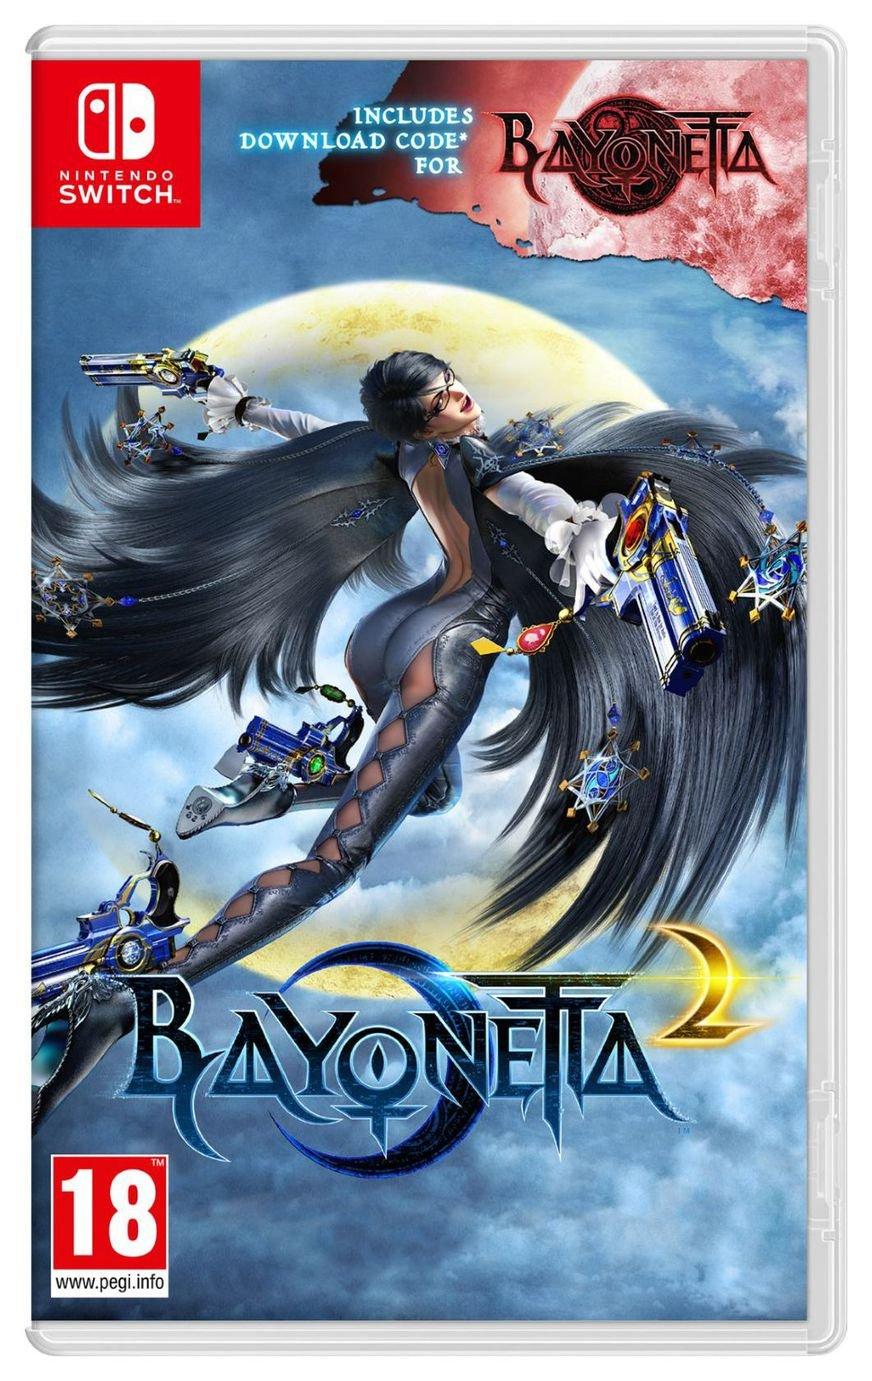 Image of Bayonetta 2 with Bayonetta DDC Nintendo Switch Game